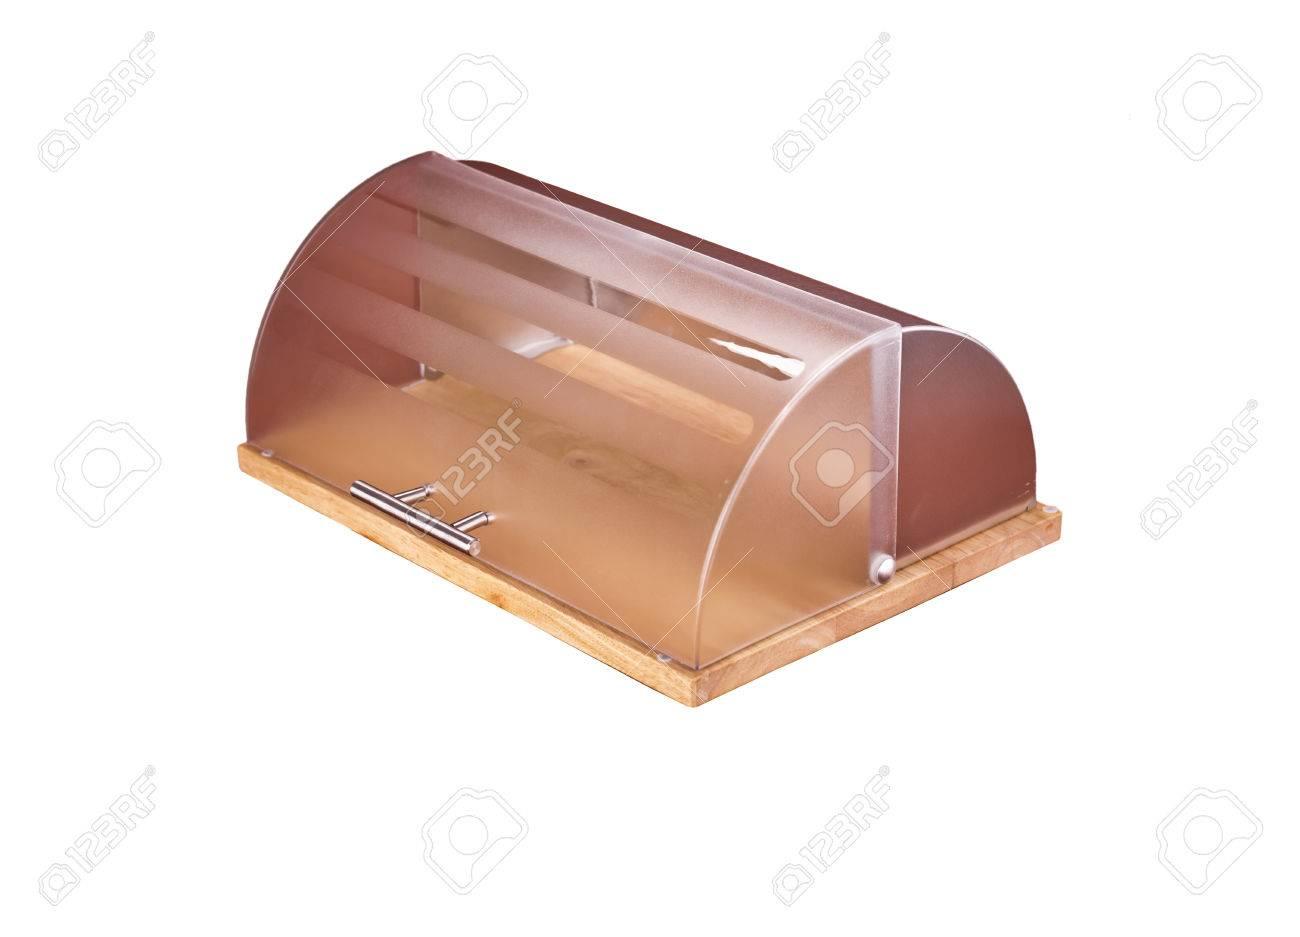 modern plastic bread box isolated stock photo picture and royalty  - modern plastic bread box isolated stock photo